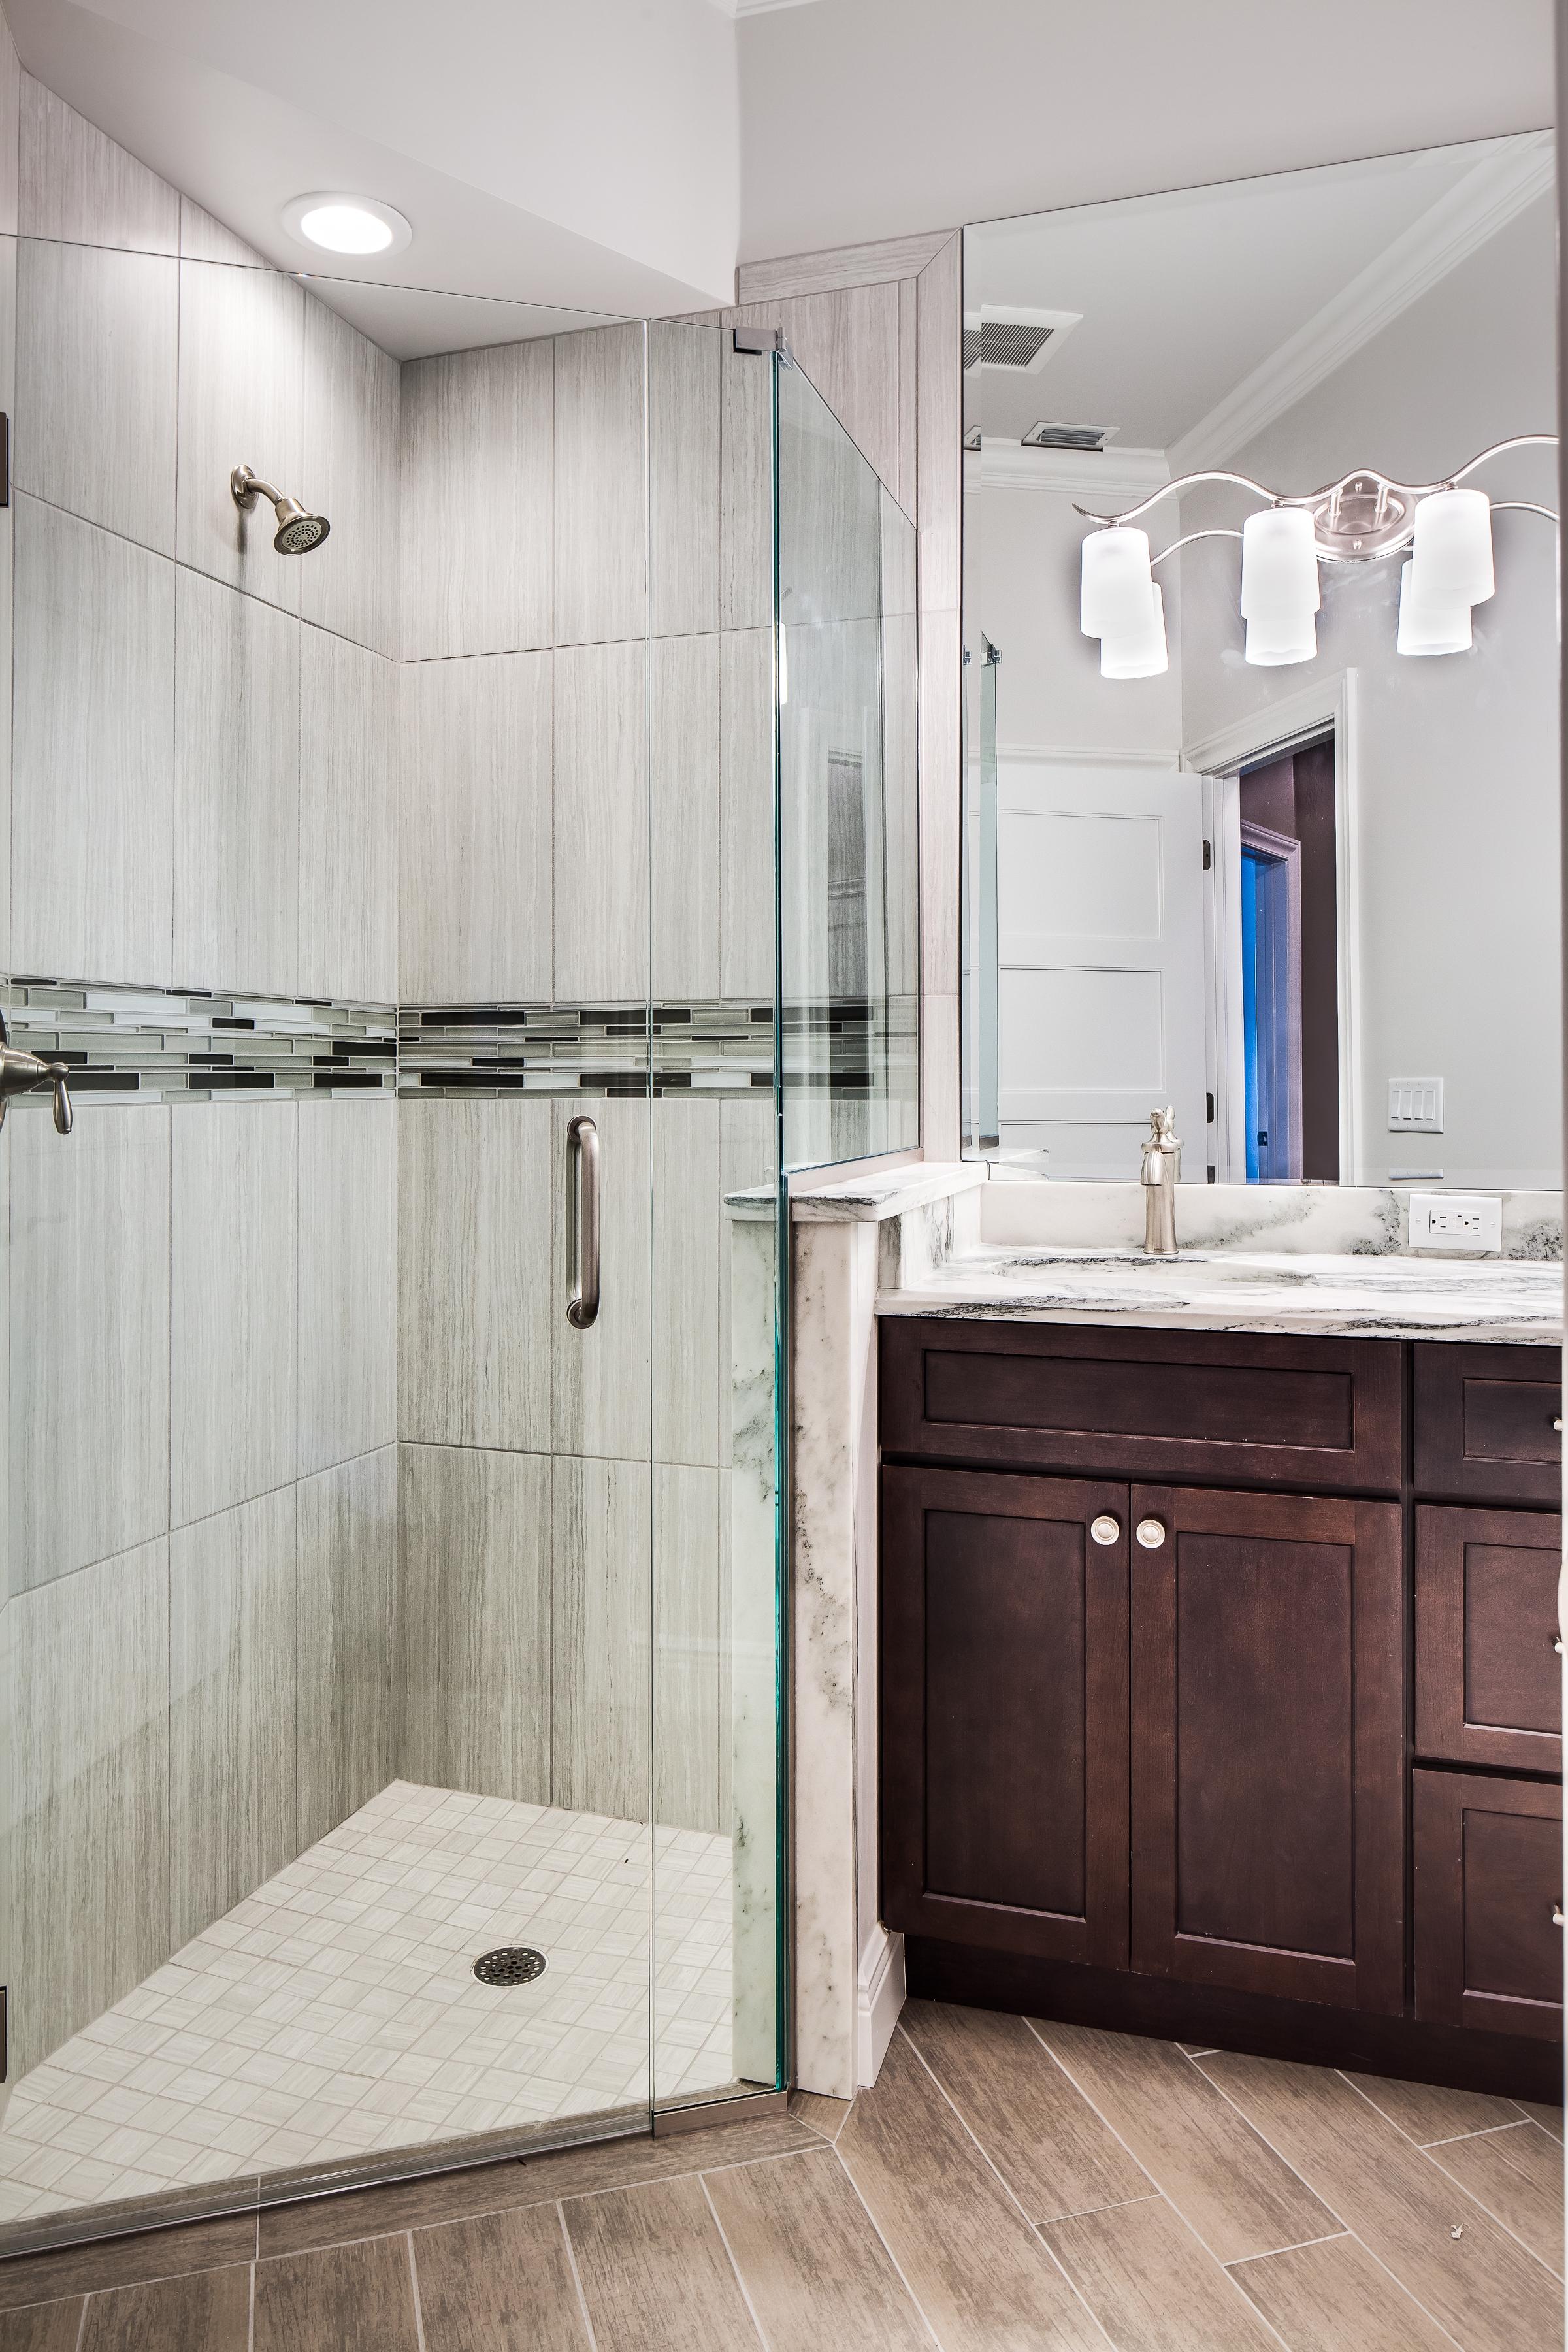 Bathroom Mirror Hanging Height